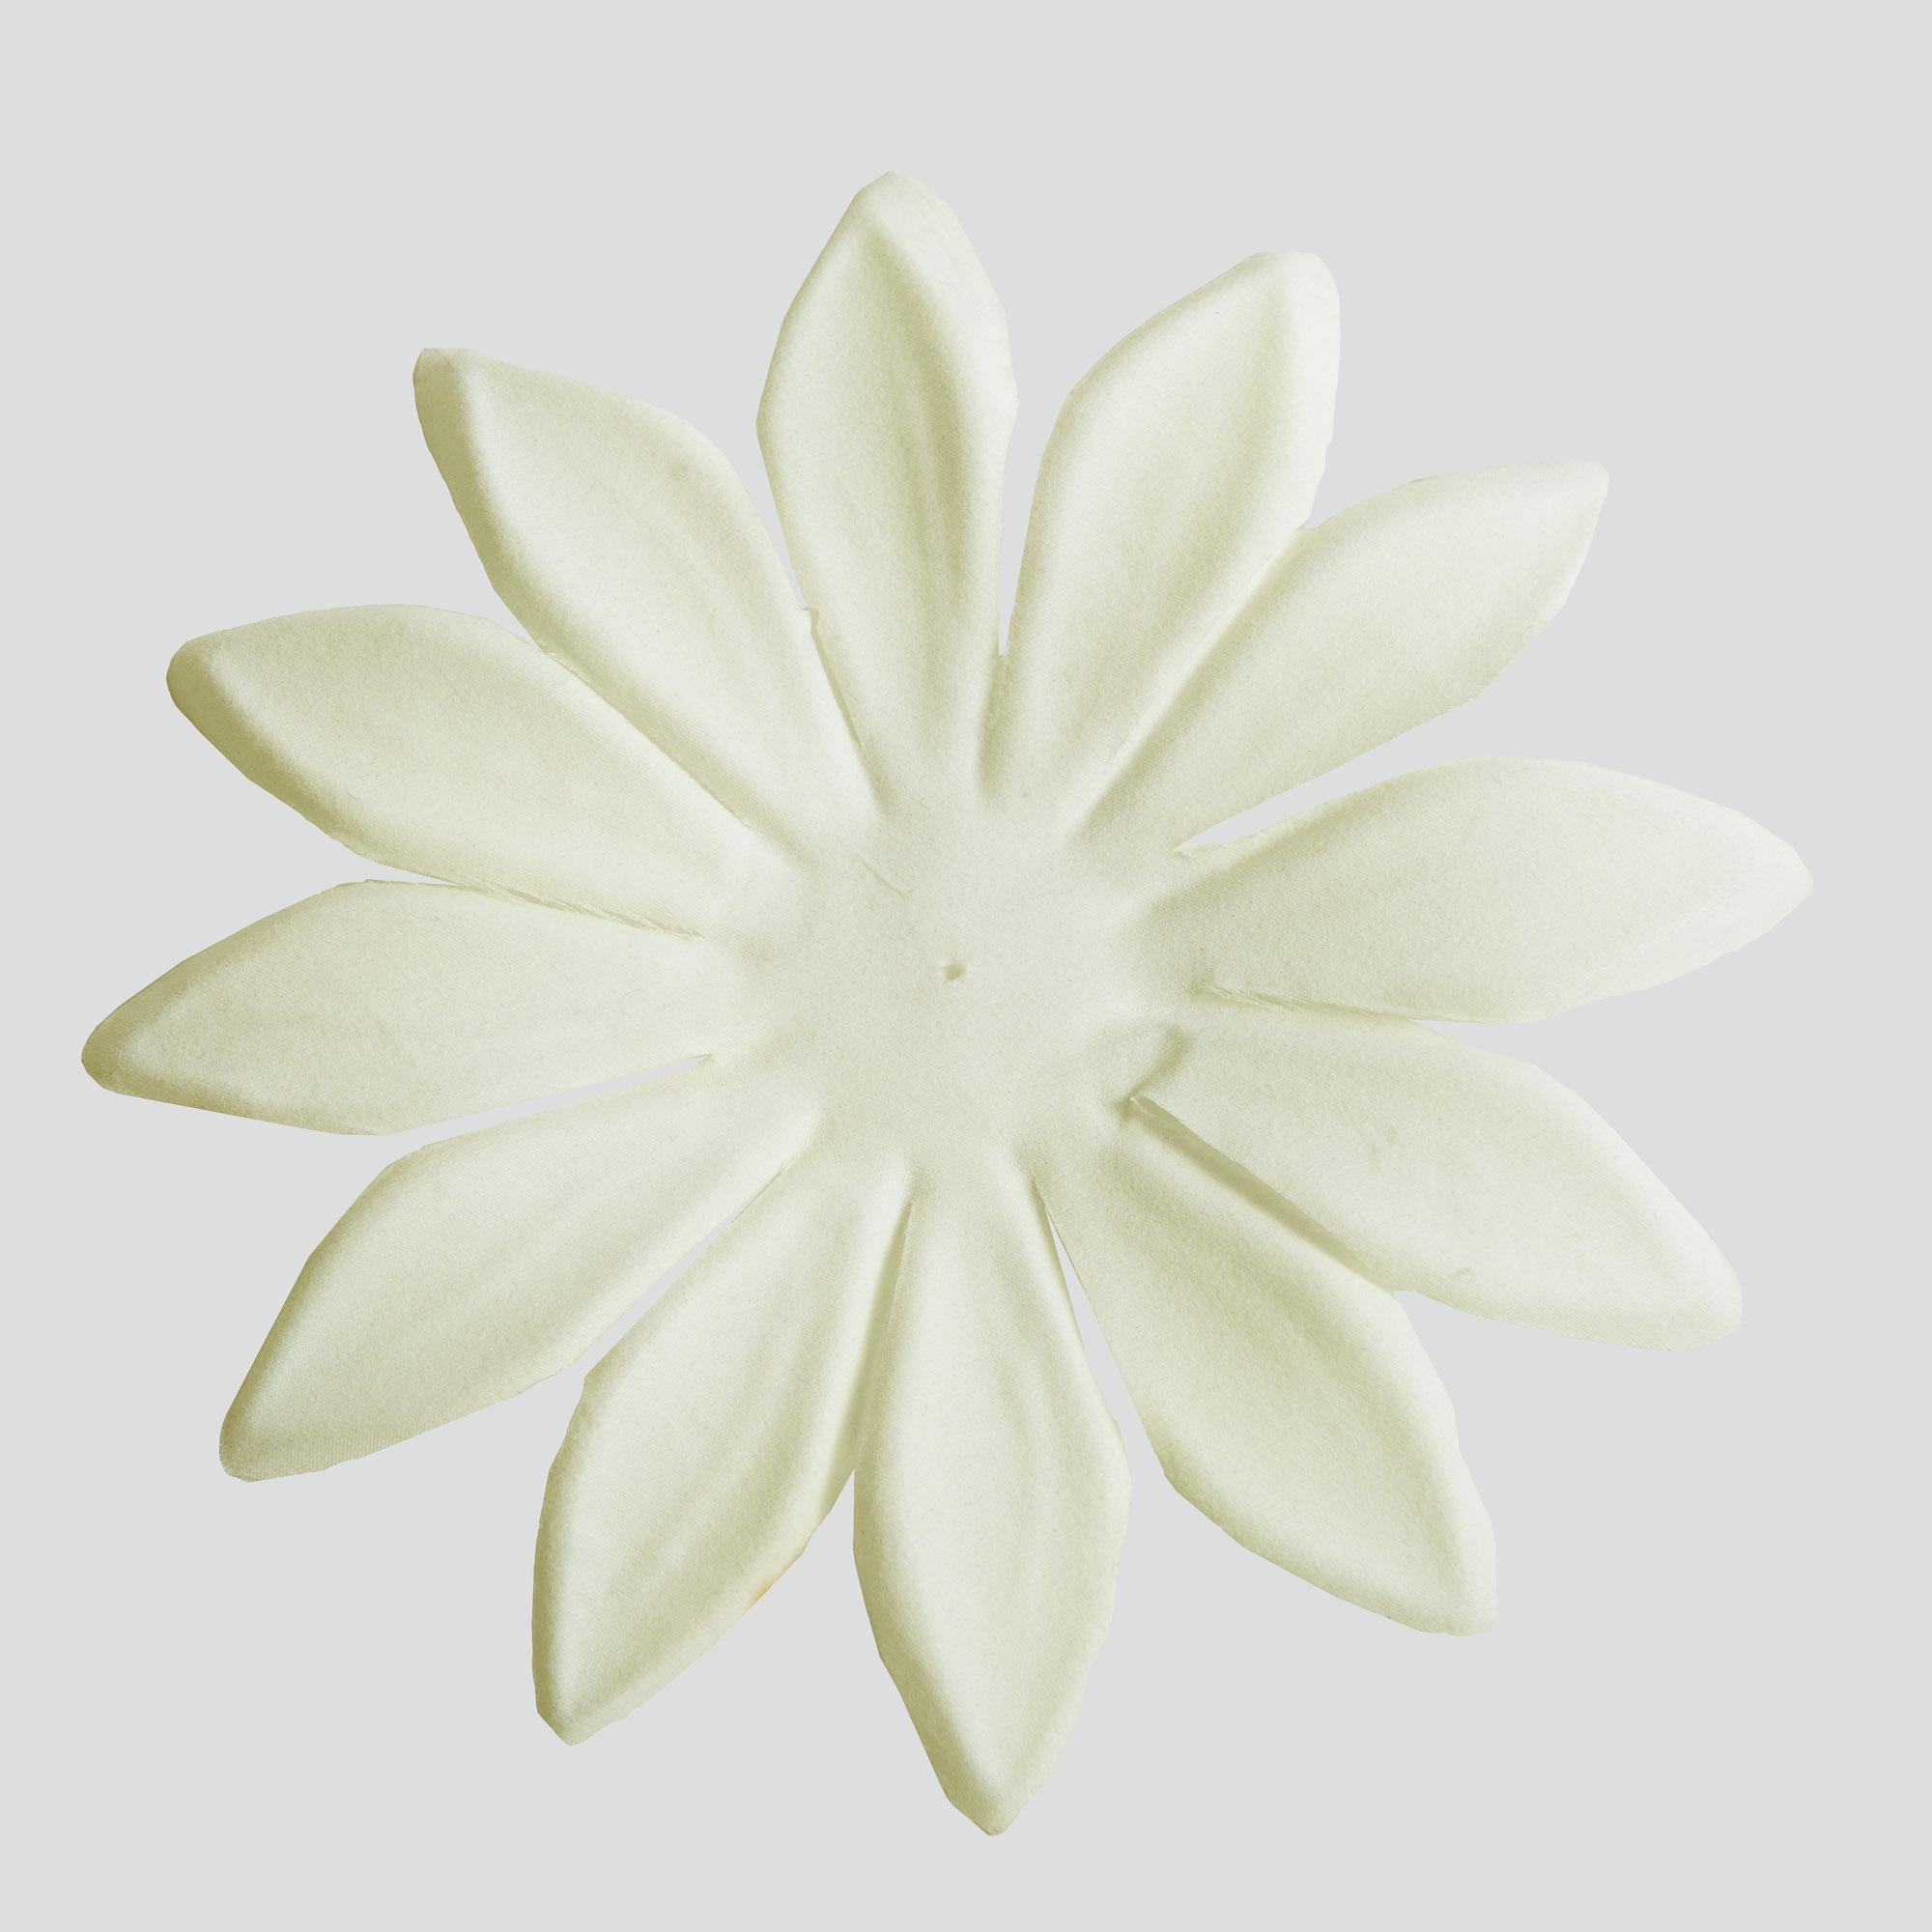 Ivory Large Satin Fabric Flower Petals 5pc 802012 05 Ivy Sun